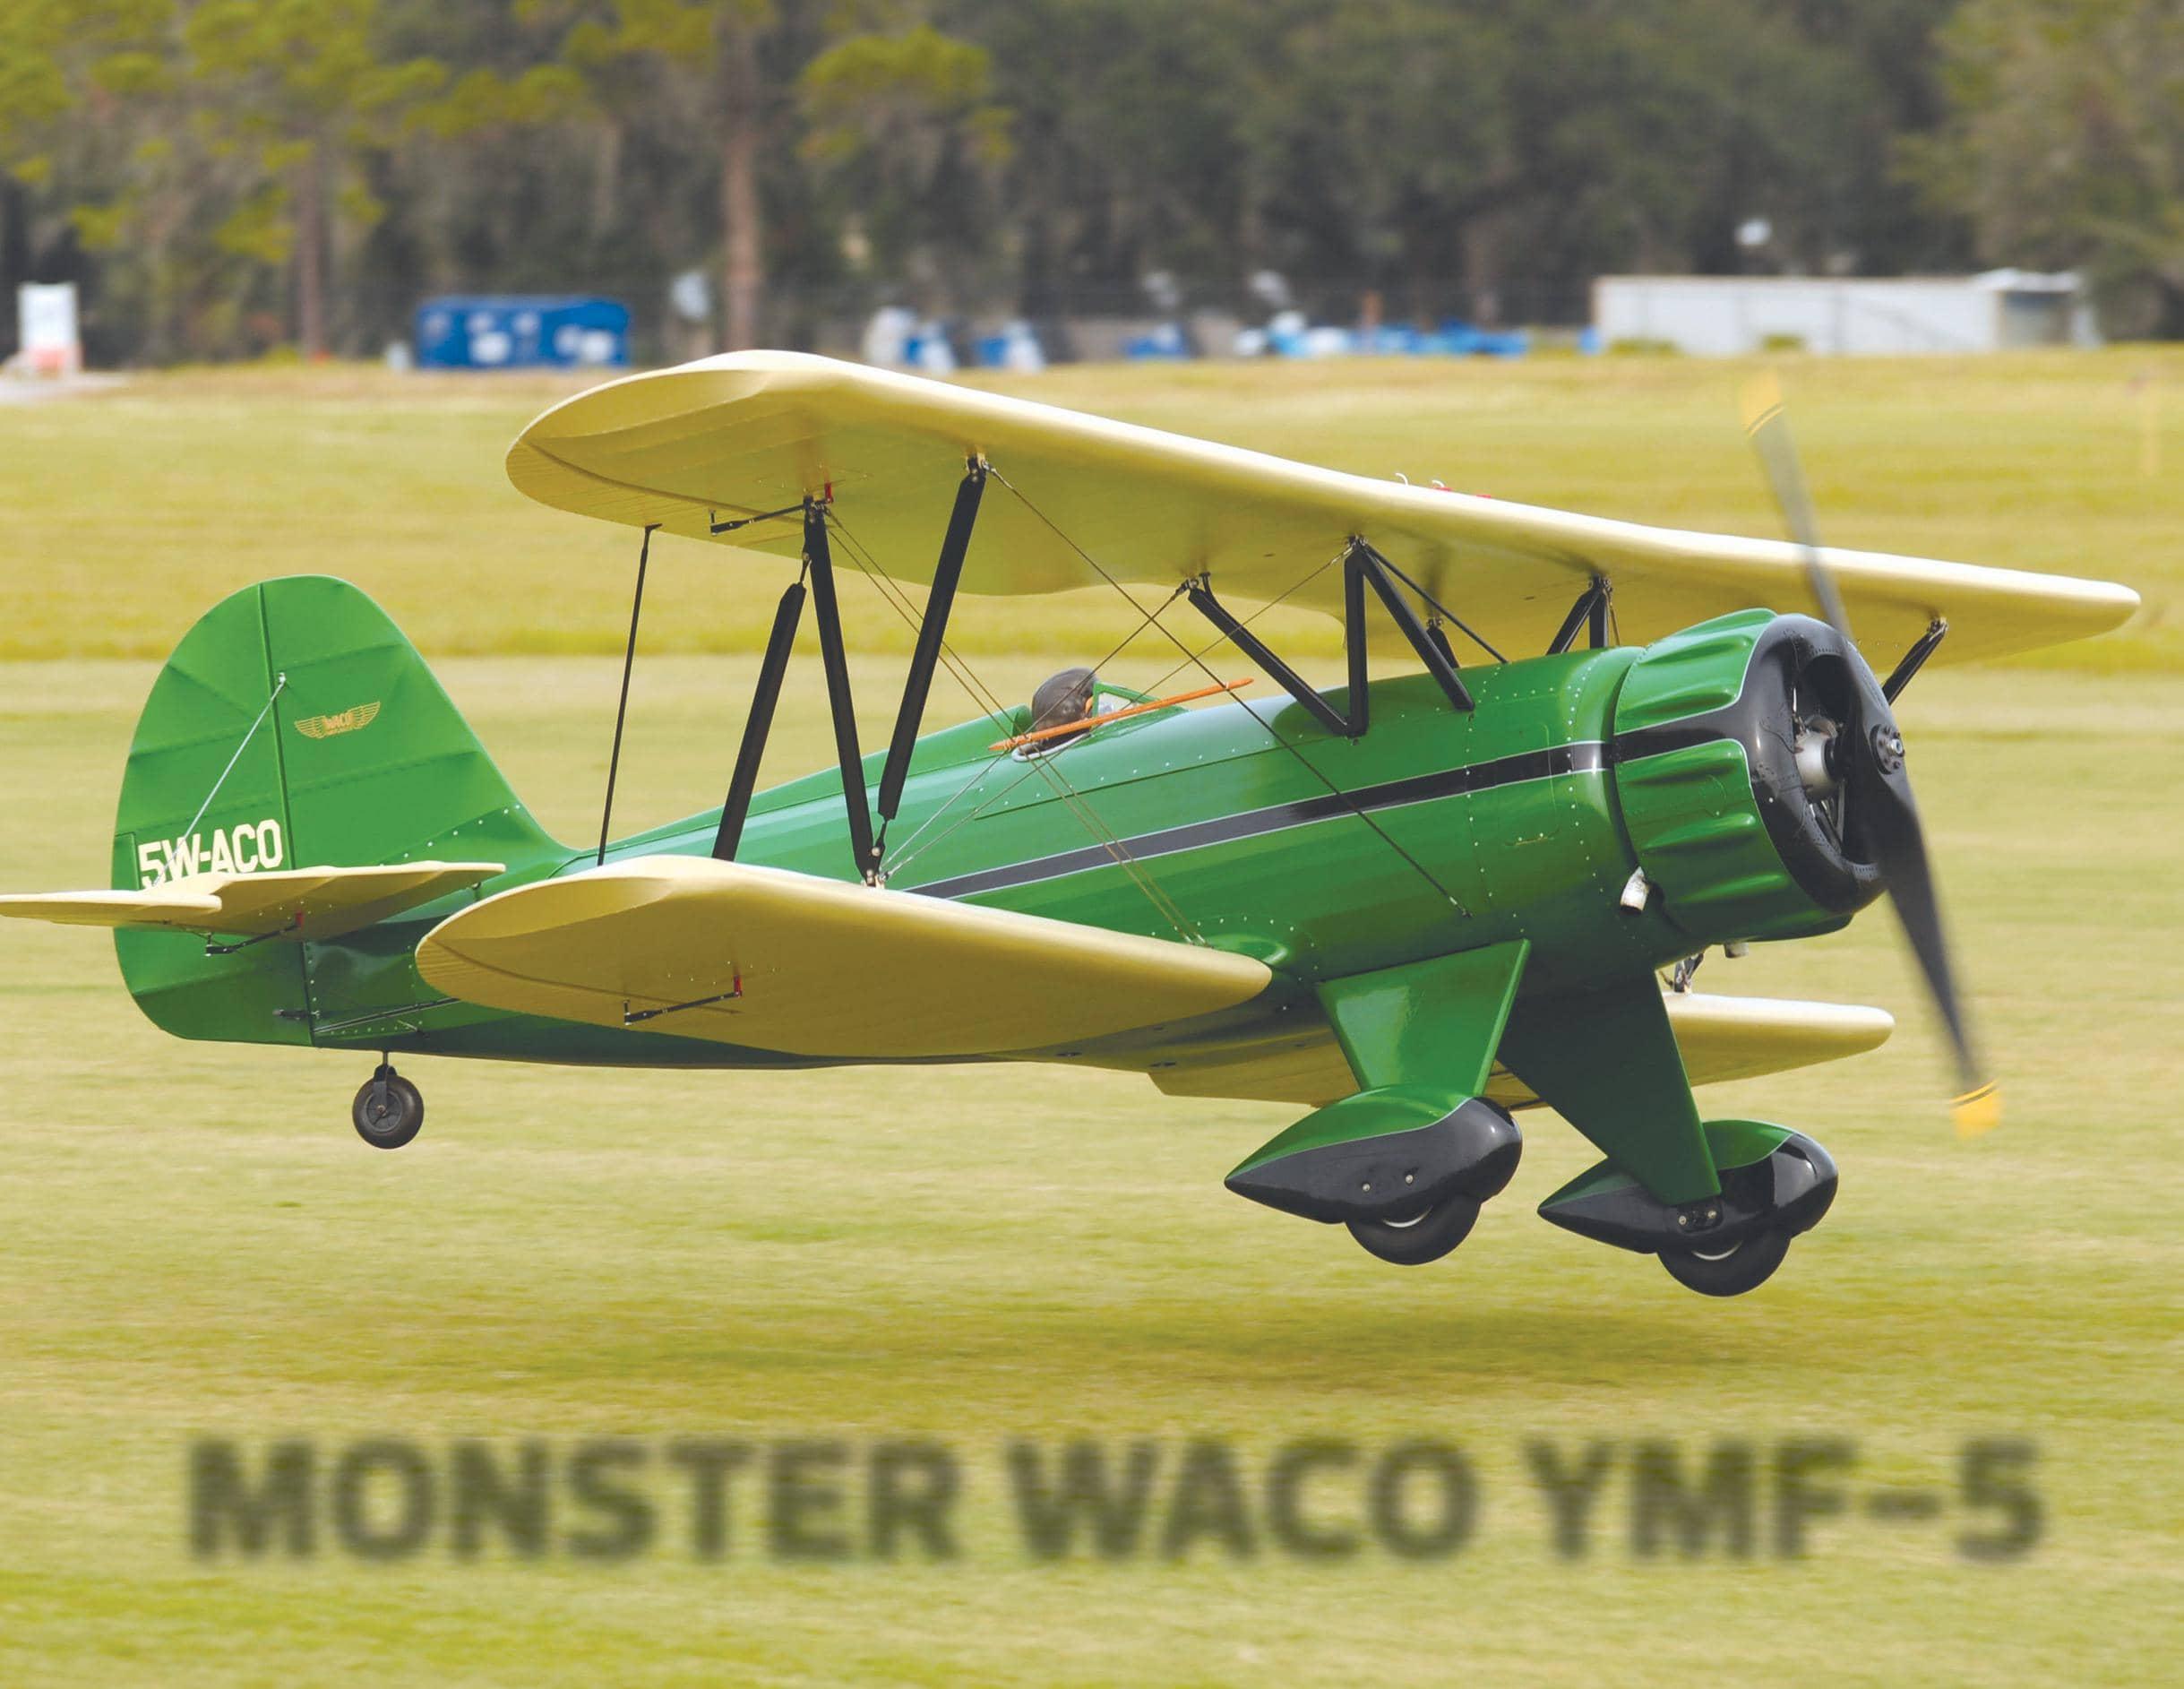 MONSTER WACO YMF-5